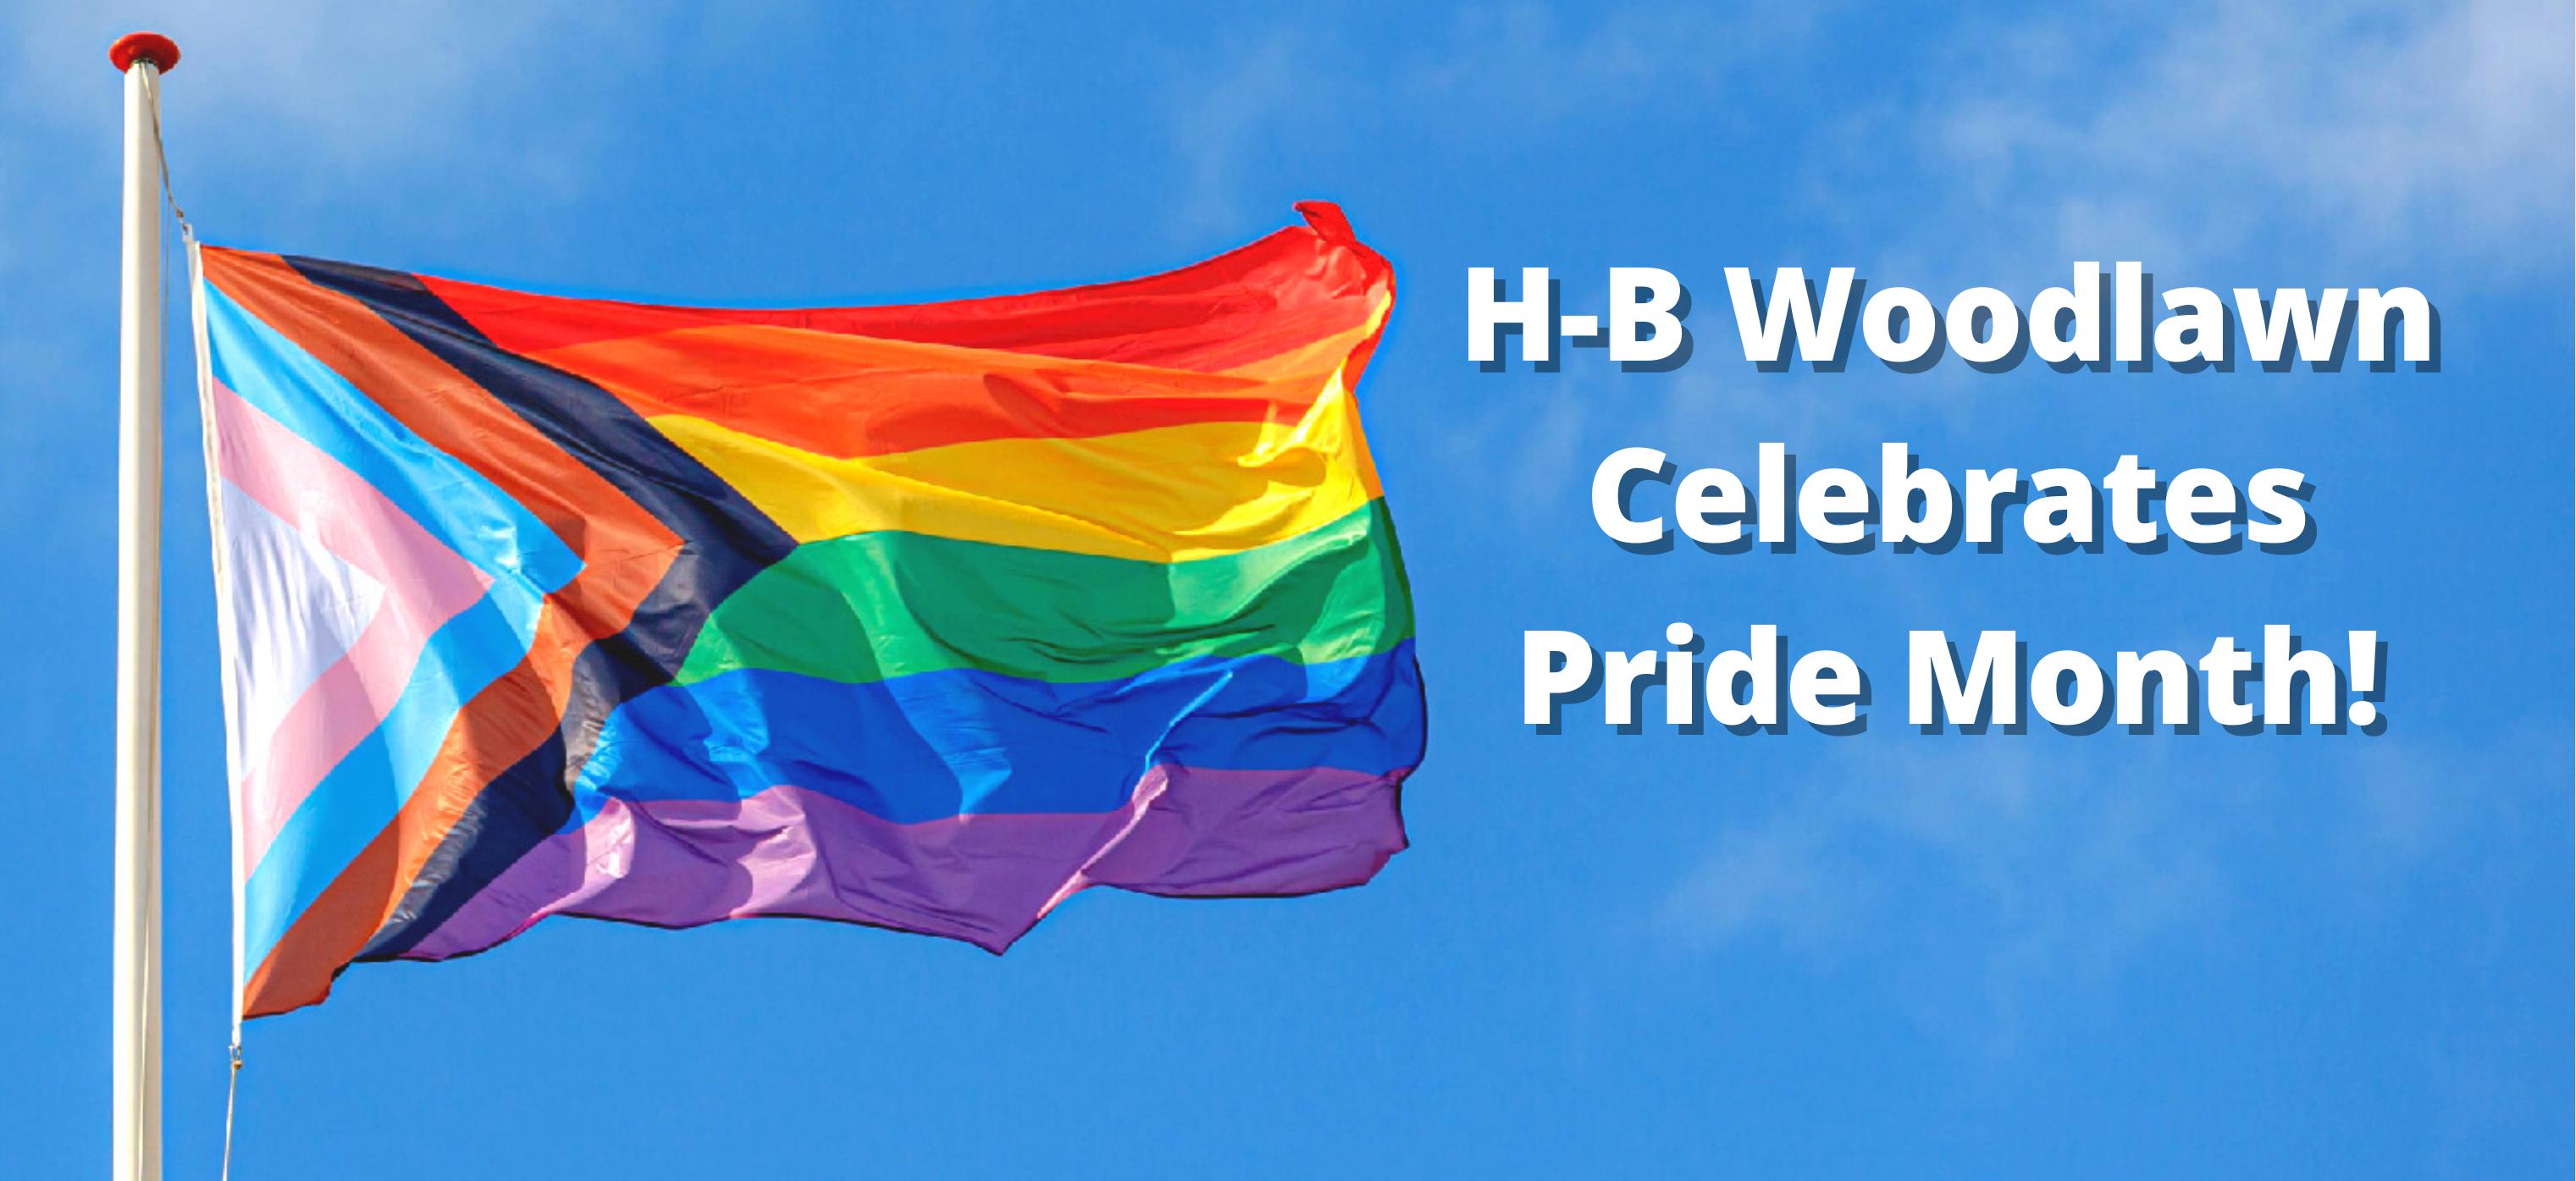 H-B Woodlawn Feiert den Pride-Monat!